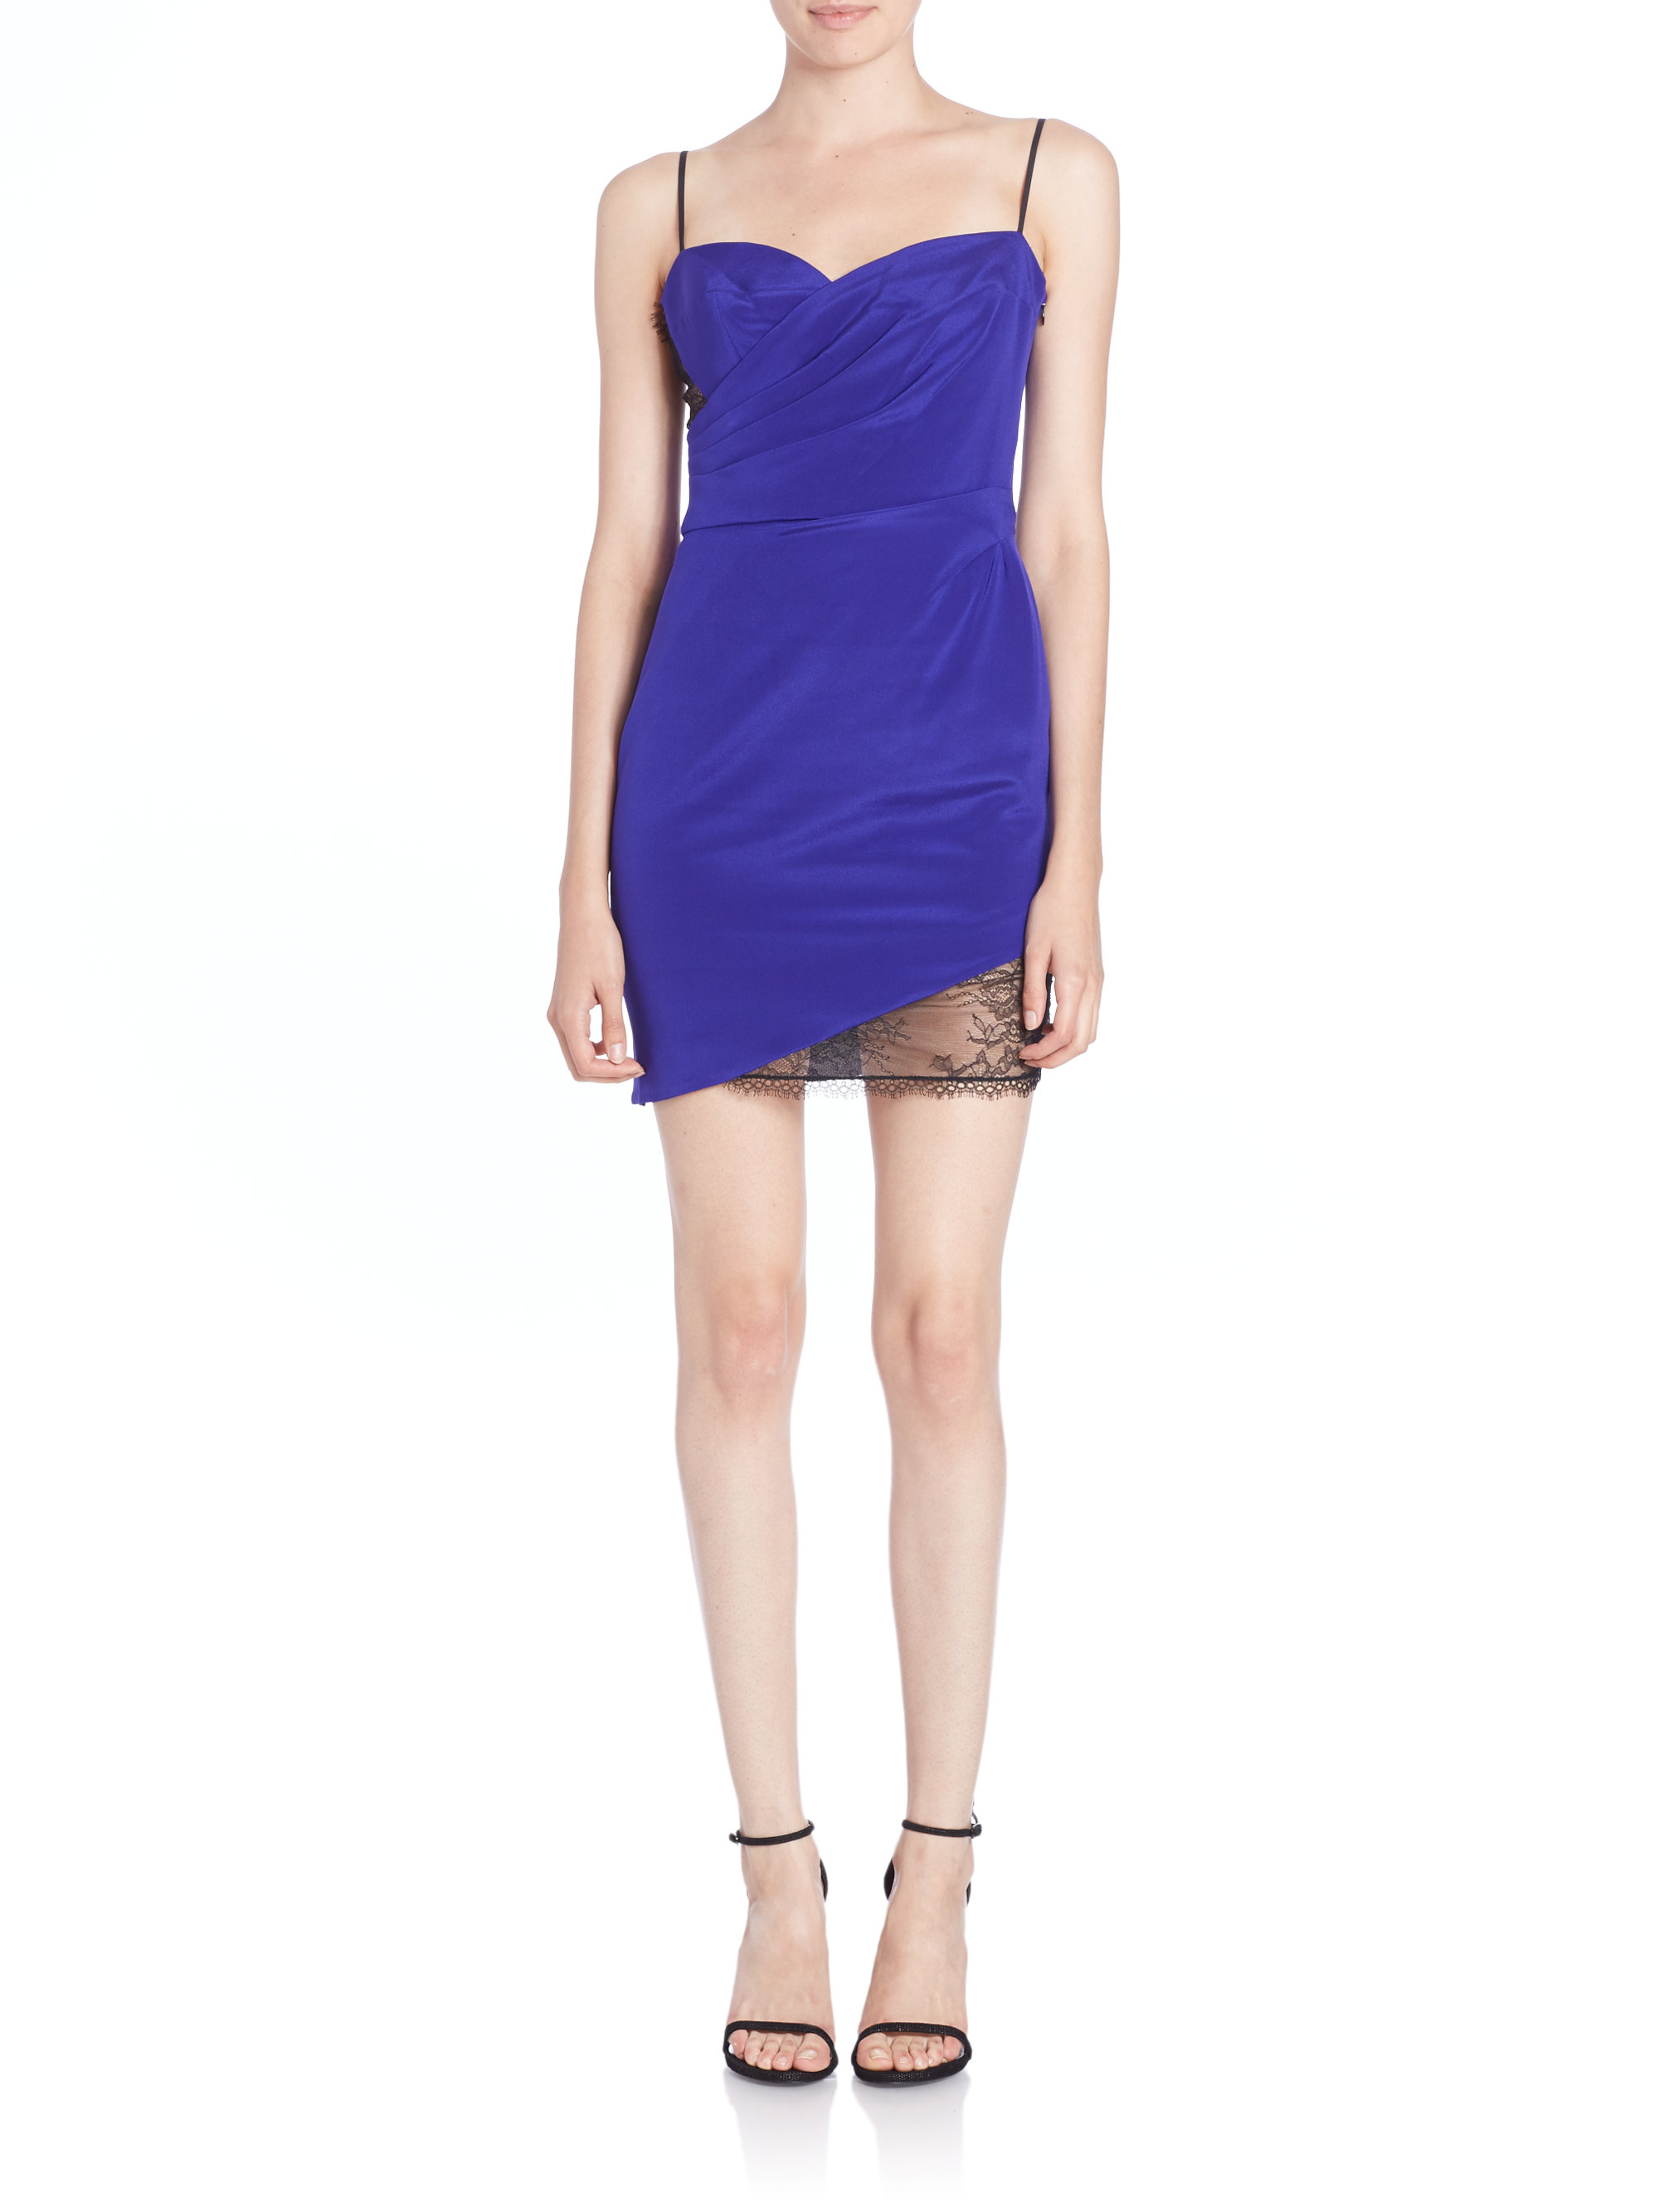 Pink Slip Dress Boutique